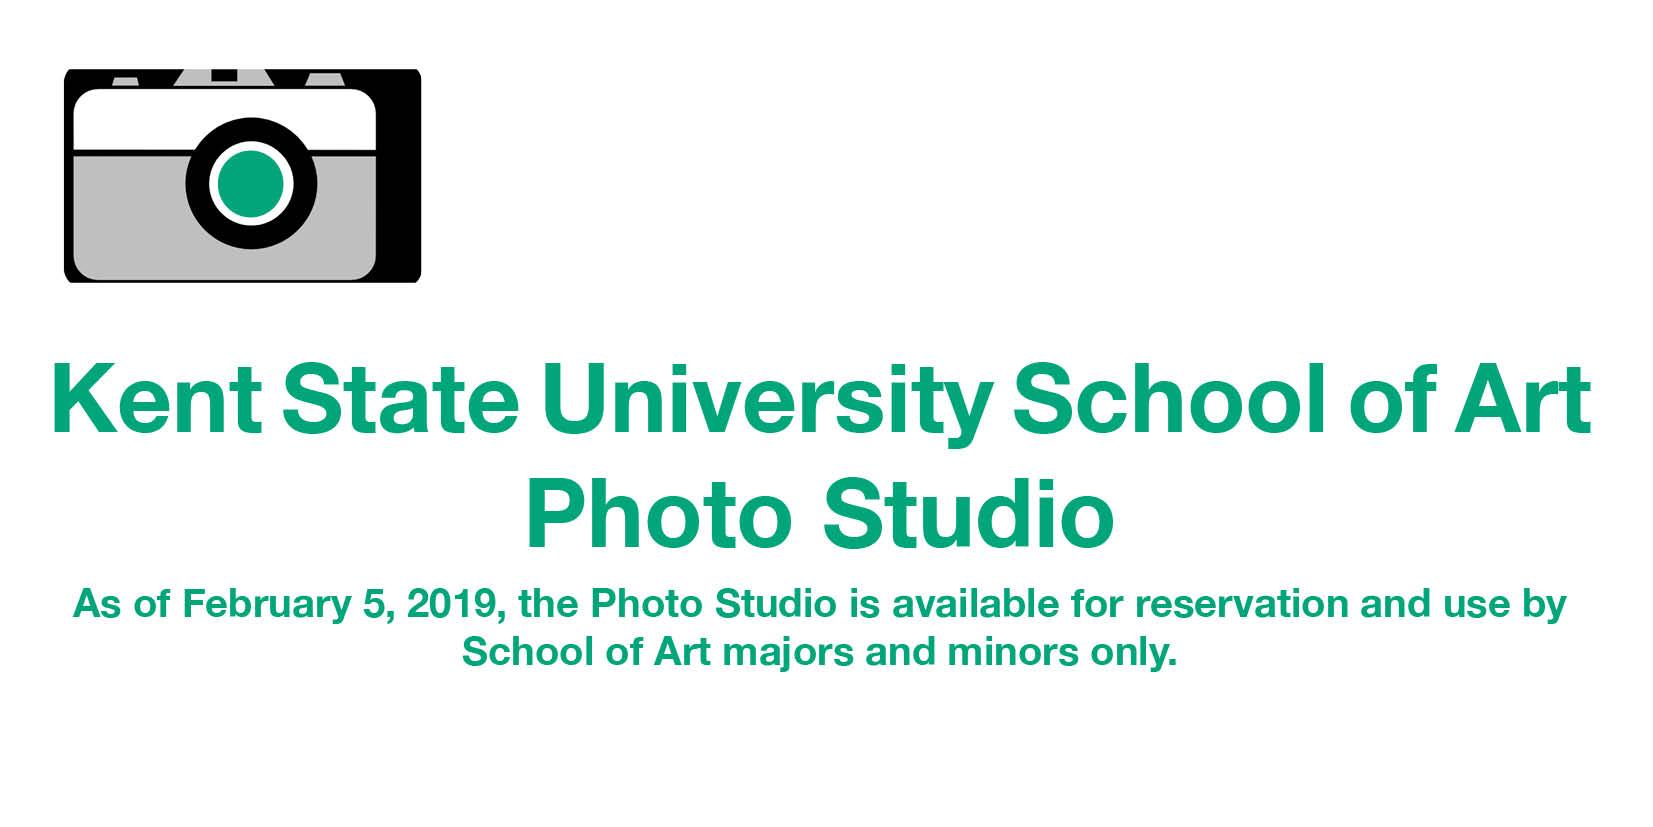 Kent State School of Art Photo Studio